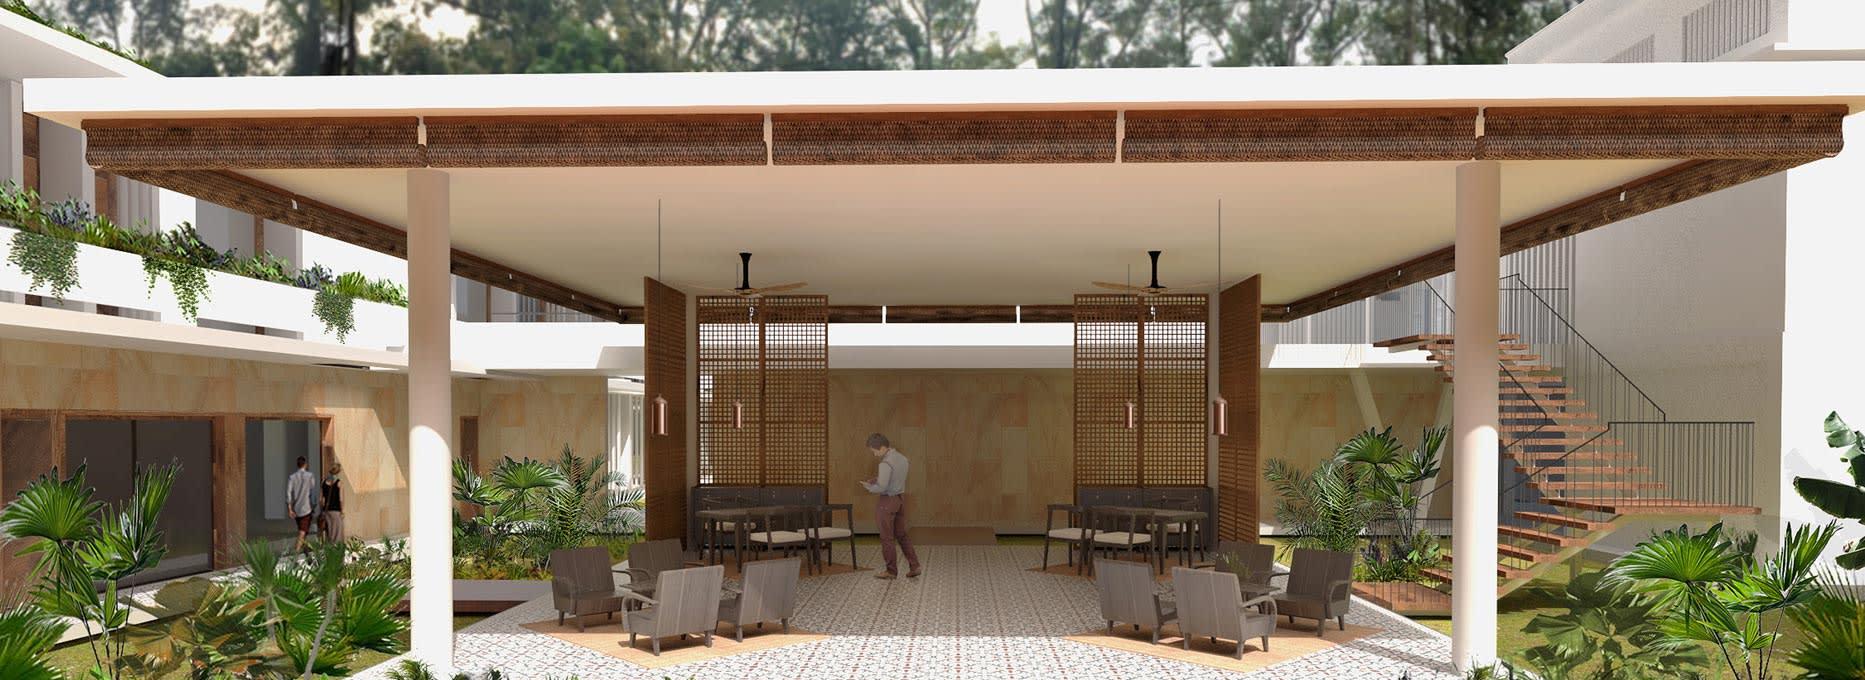 Lobby at FCC Angkor, Managed by Avani Hotels & Resorts